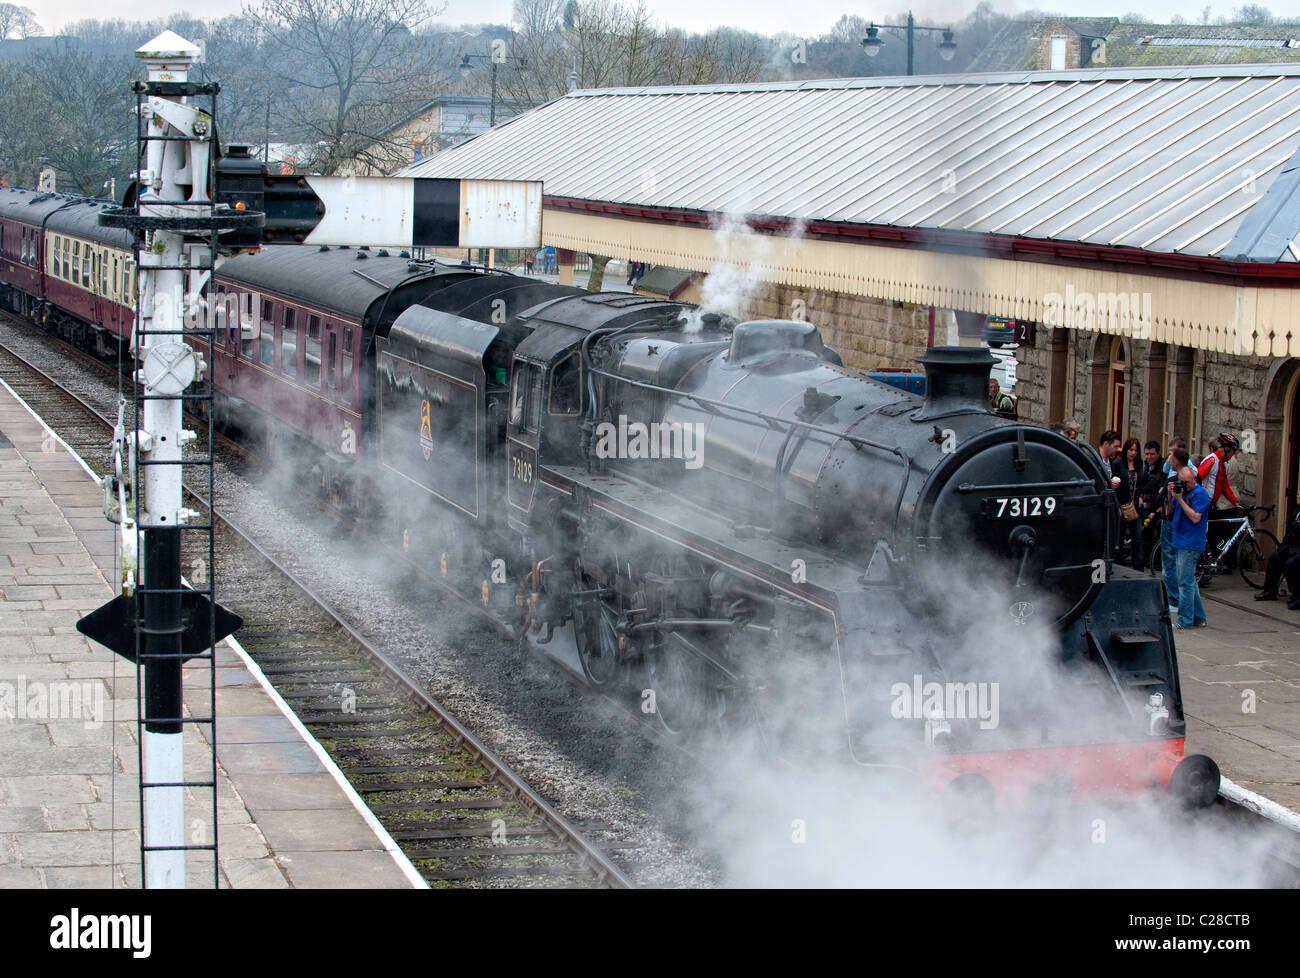 Steam locomotive pulls into the platform at Ramsbottom Station on the East Lancs Railway - Stock Image